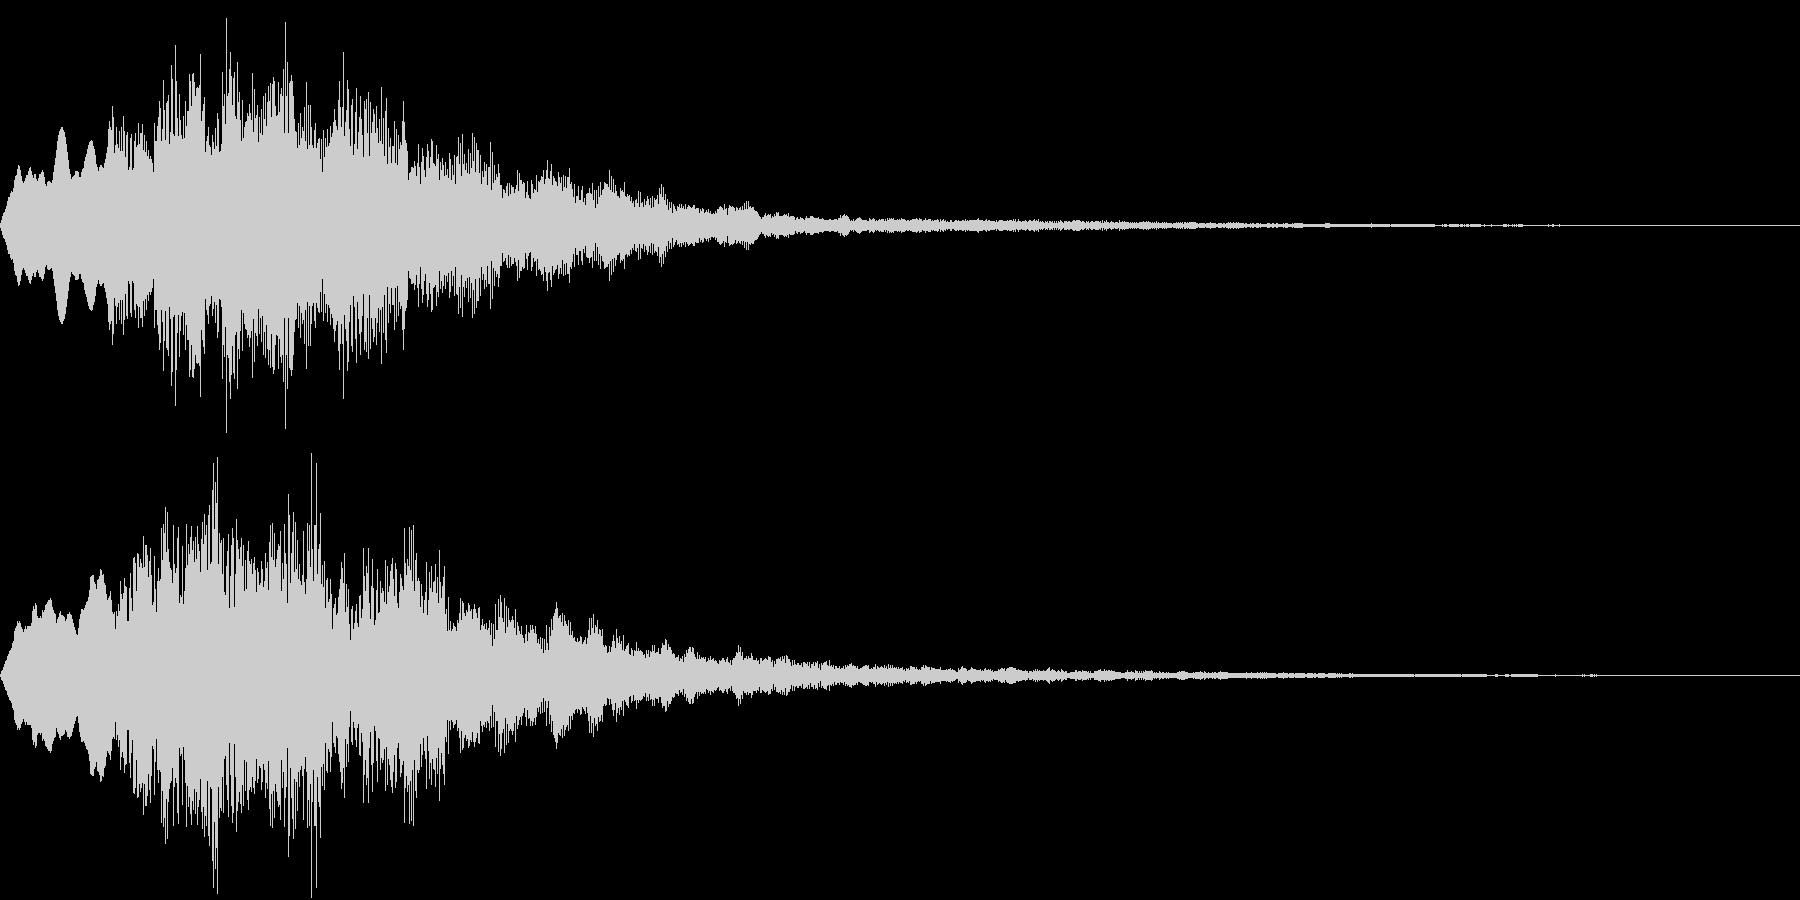 Level 短めのレベルアップSE 3の未再生の波形